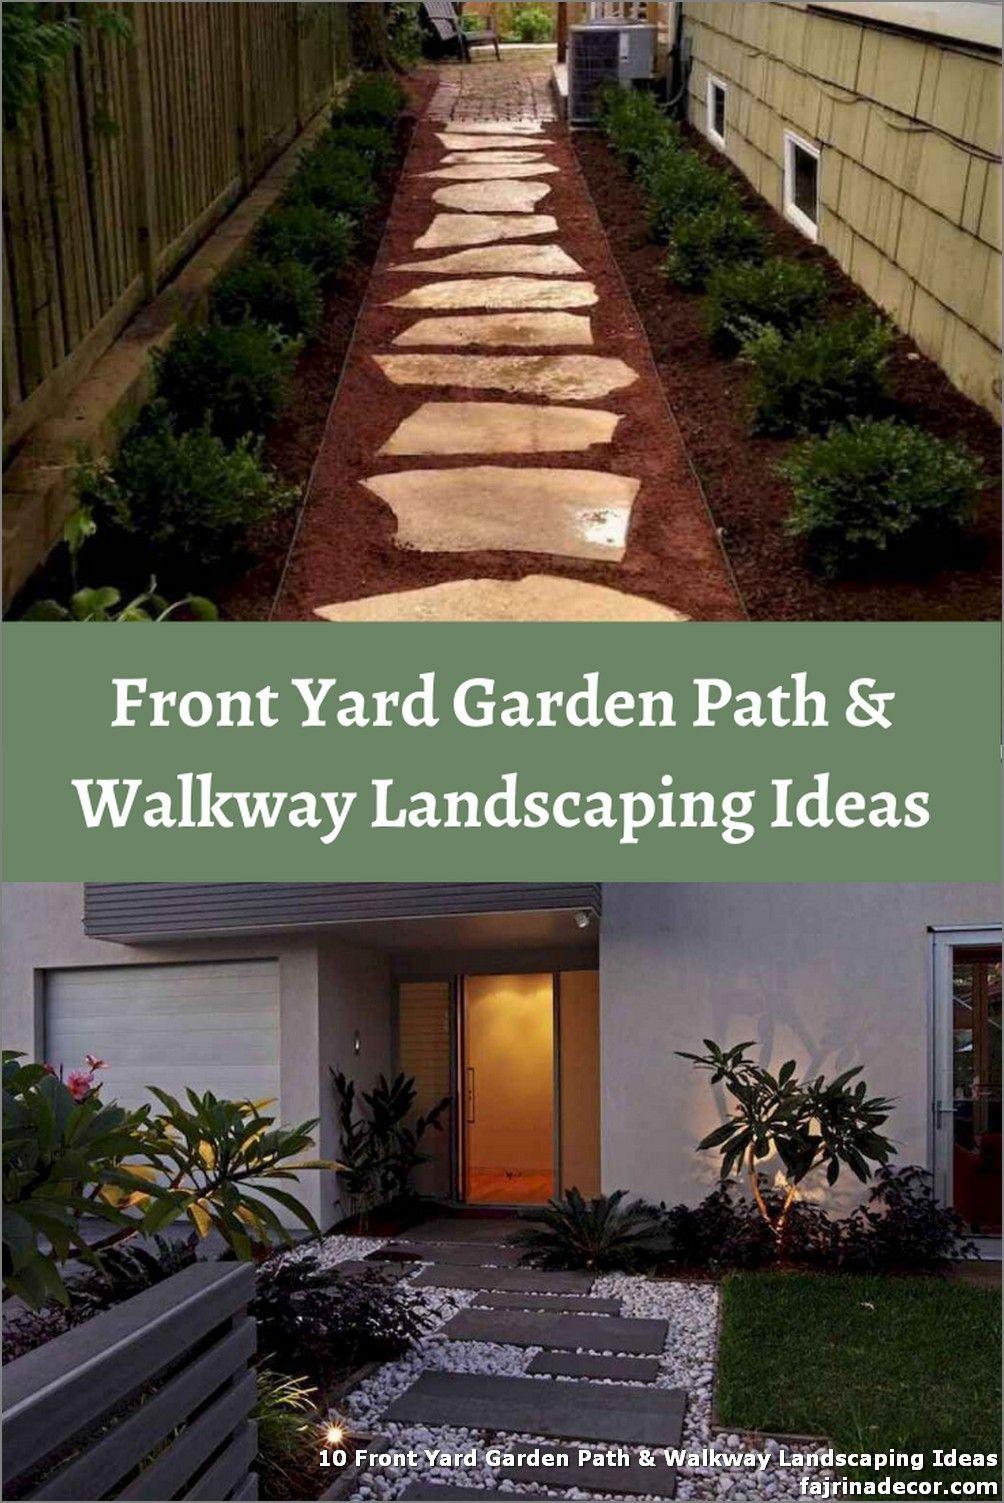 10 Walkway Landscaping Ideas